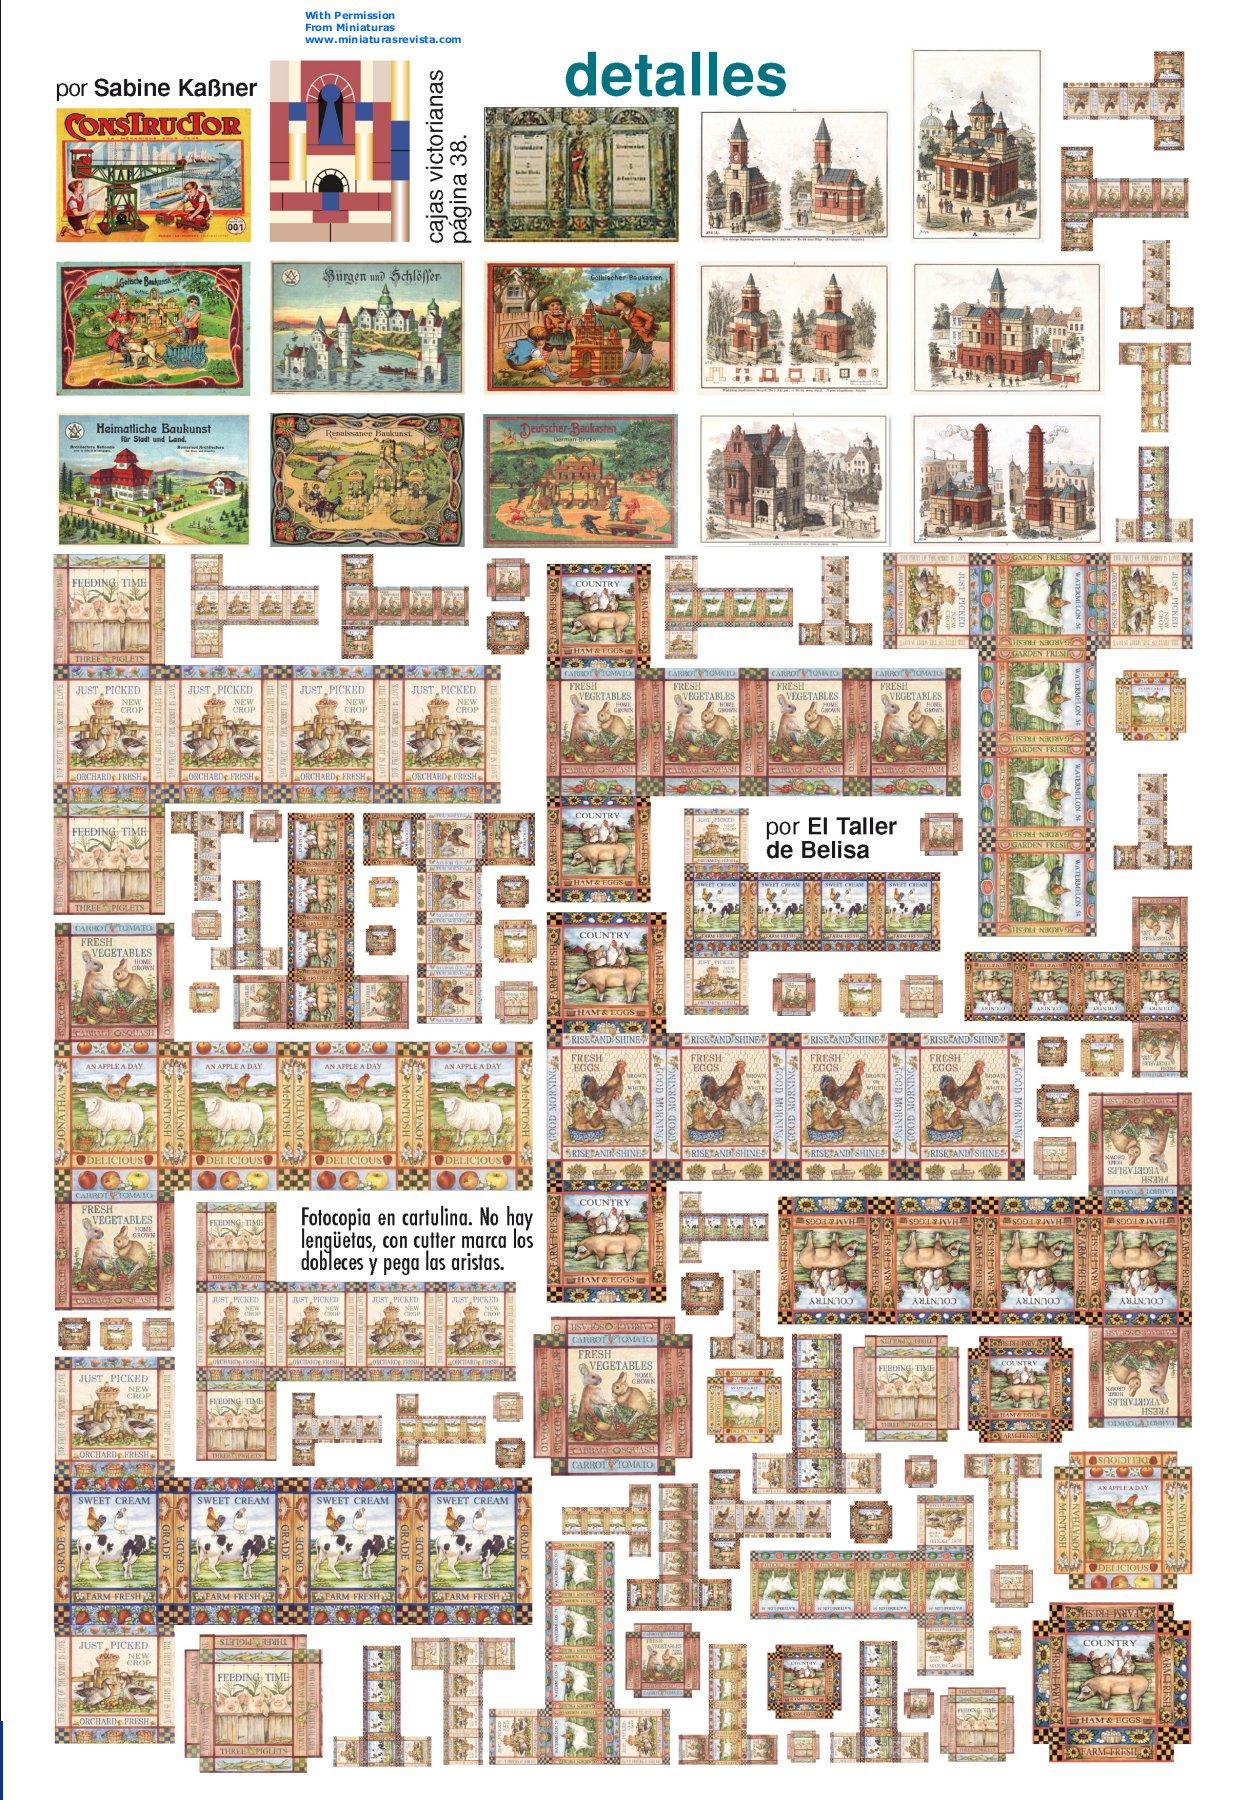 Valerie Bursic (Valb2561) On Pinterest - Free Printable Miniature Book Covers